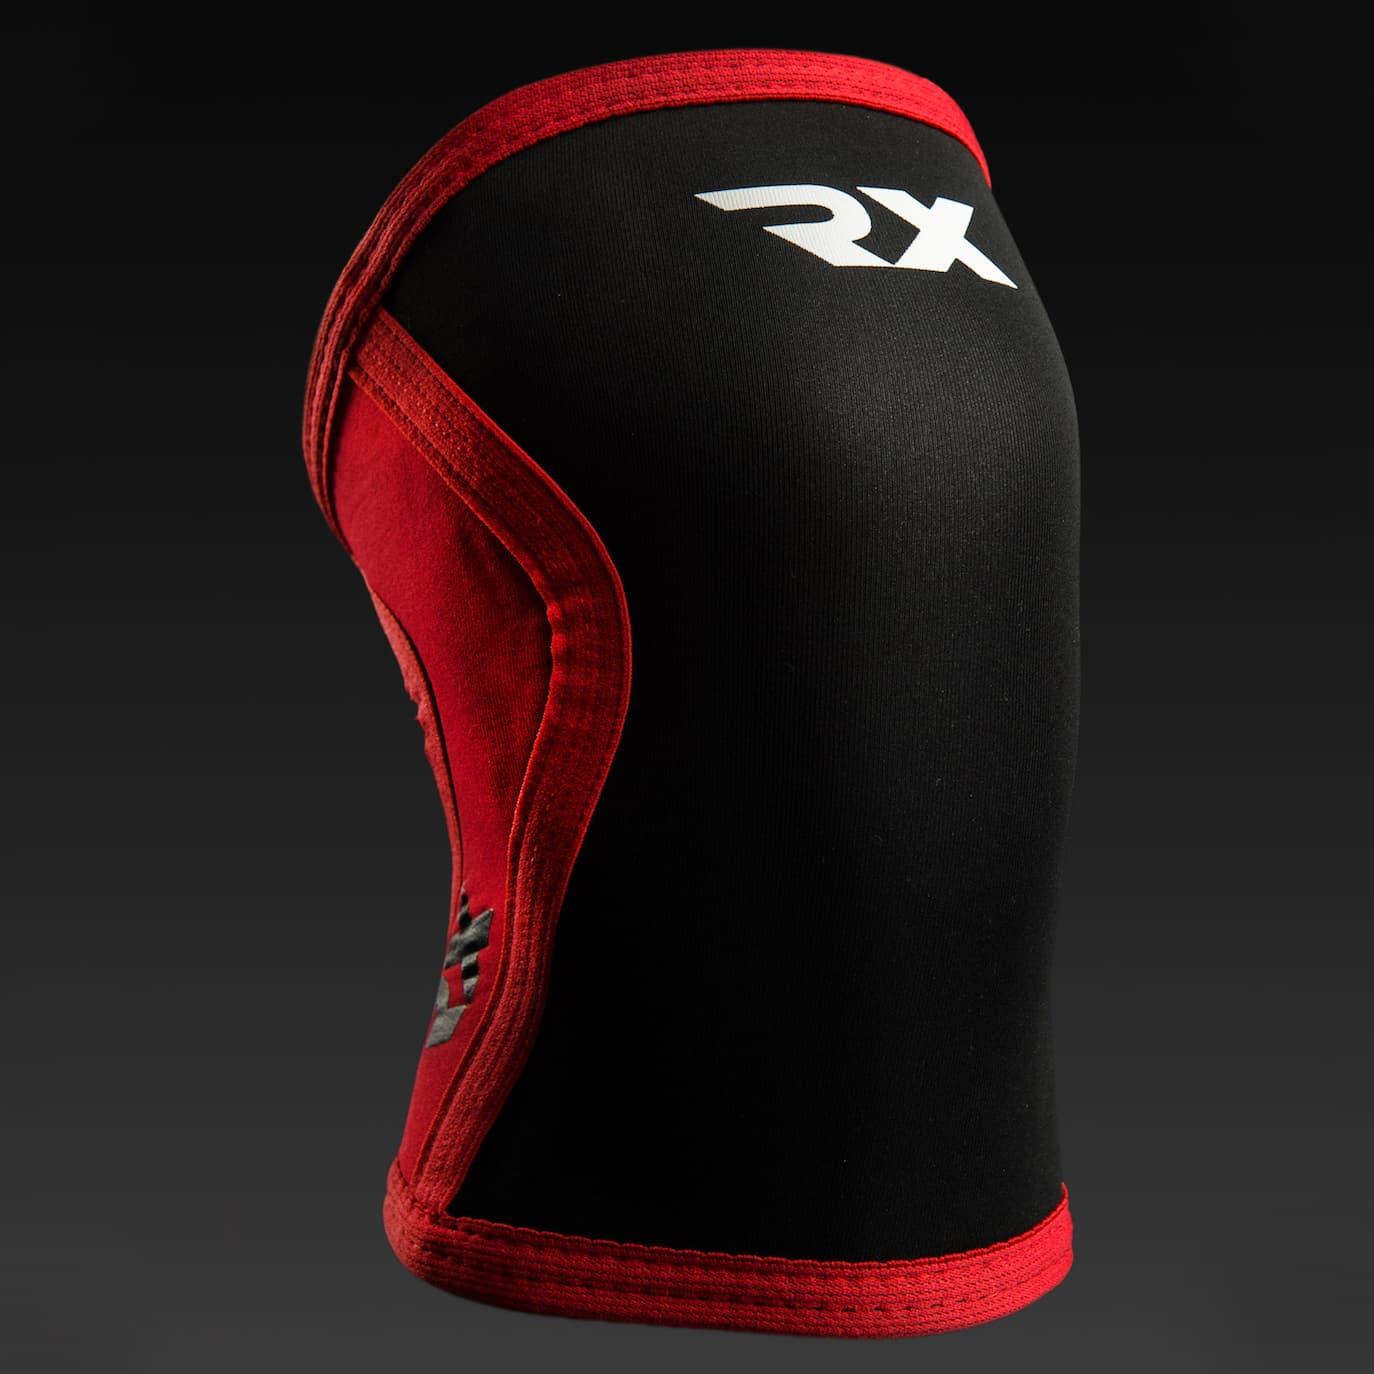 Наколенники RX 3мм